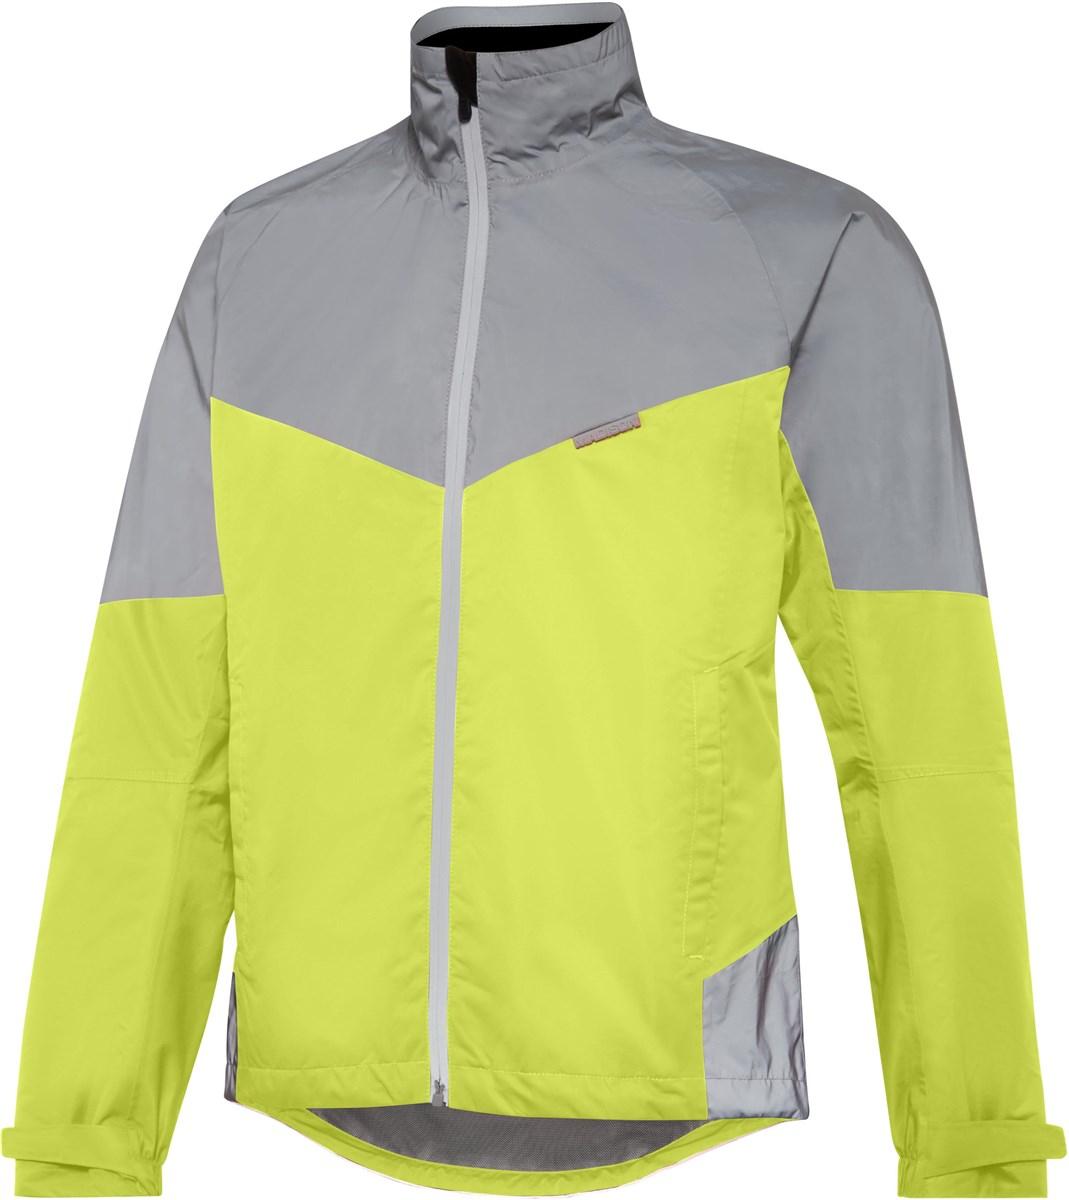 Madison Stellar reflective cycling jacket S-XL (Mens / Ladies Versions) + Free Light Set £49.99 @ Tredz